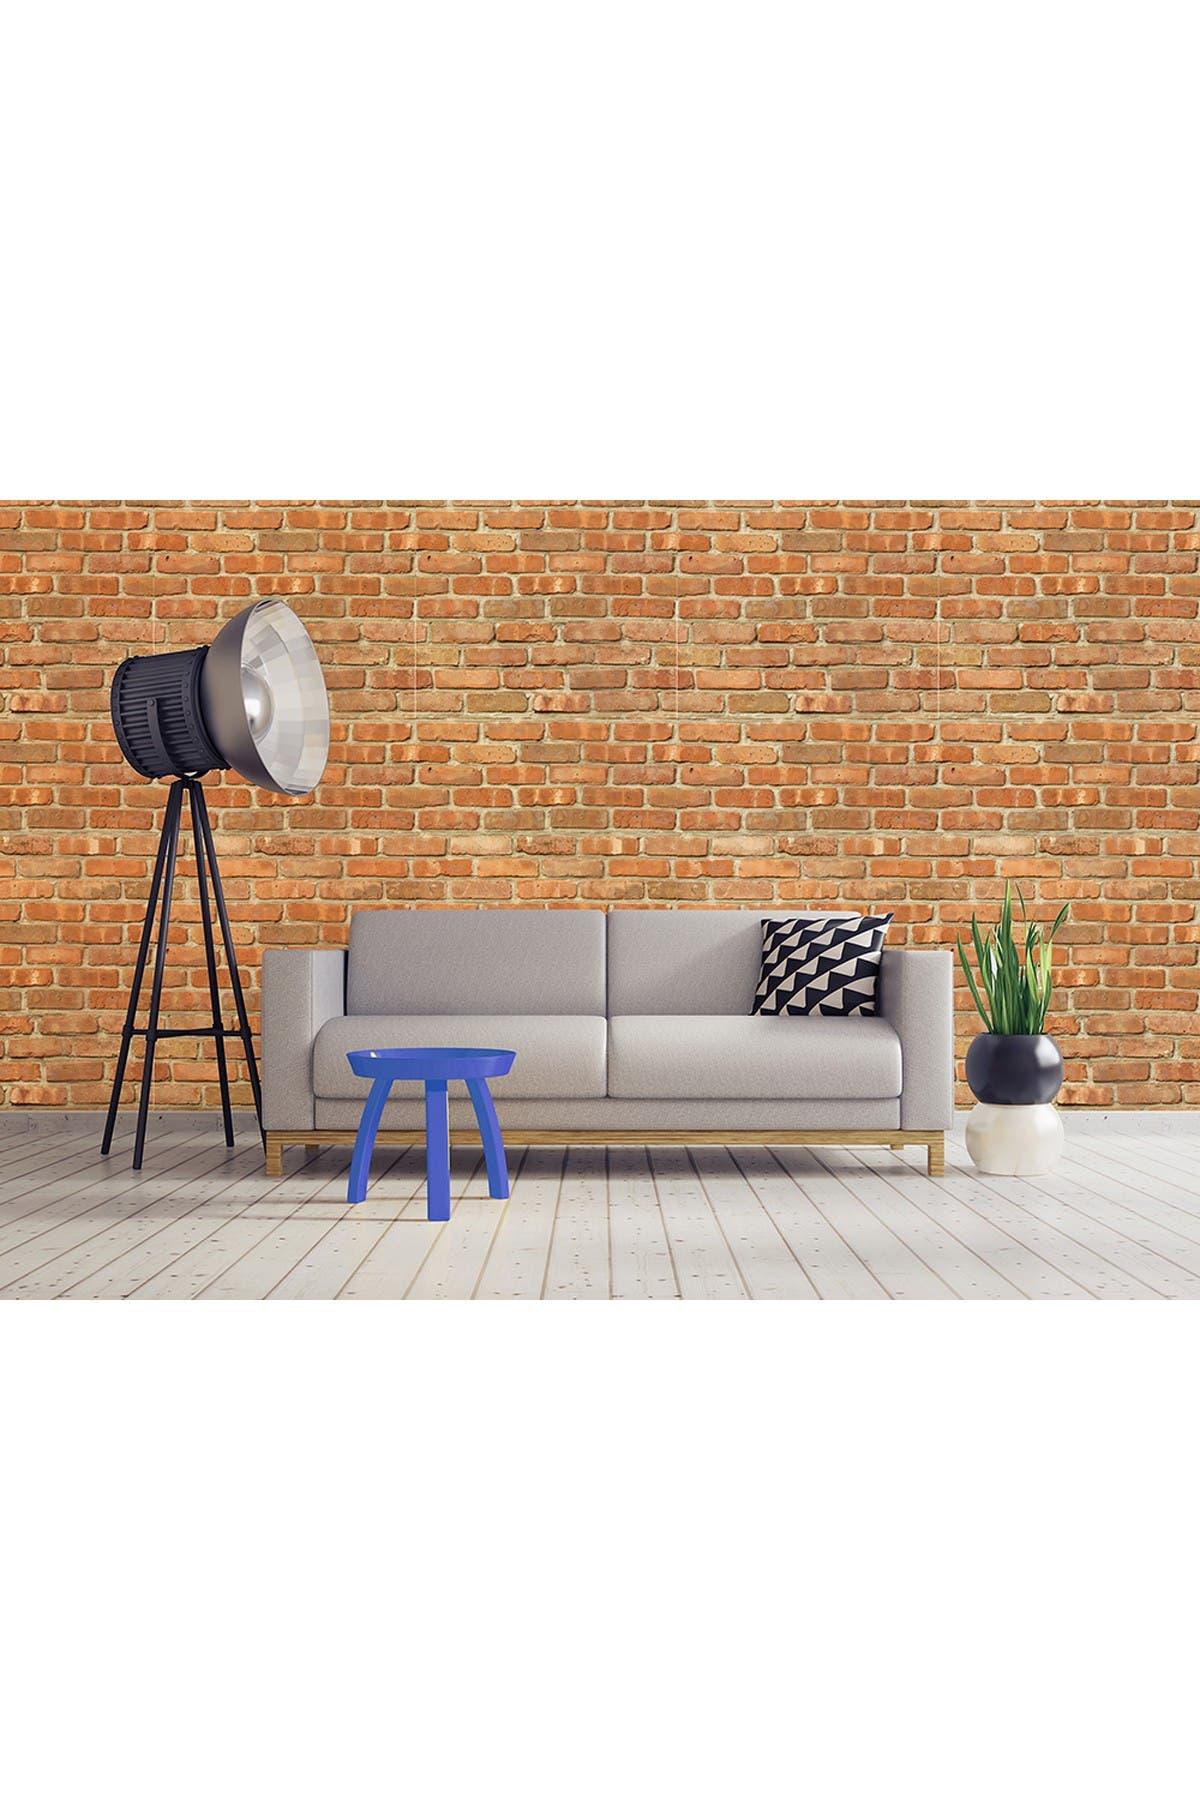 Image of WalPlus London Topaz Brickwall Panel Self Adhesive Wallpaper